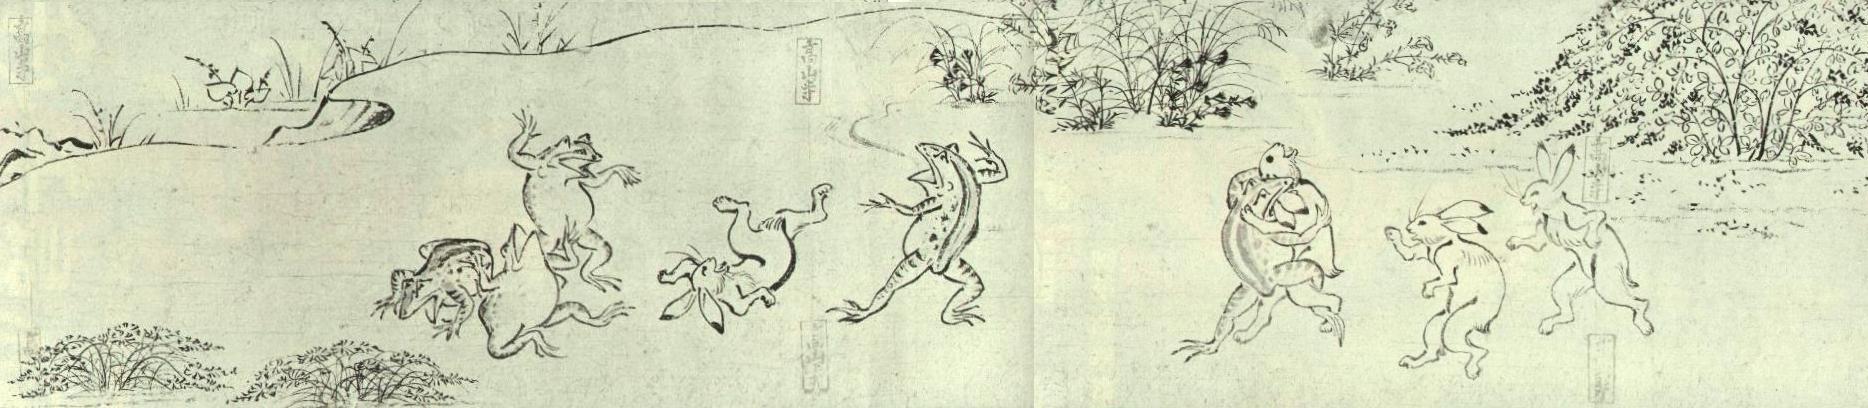 Chouju_1st_scroll-05.jpg